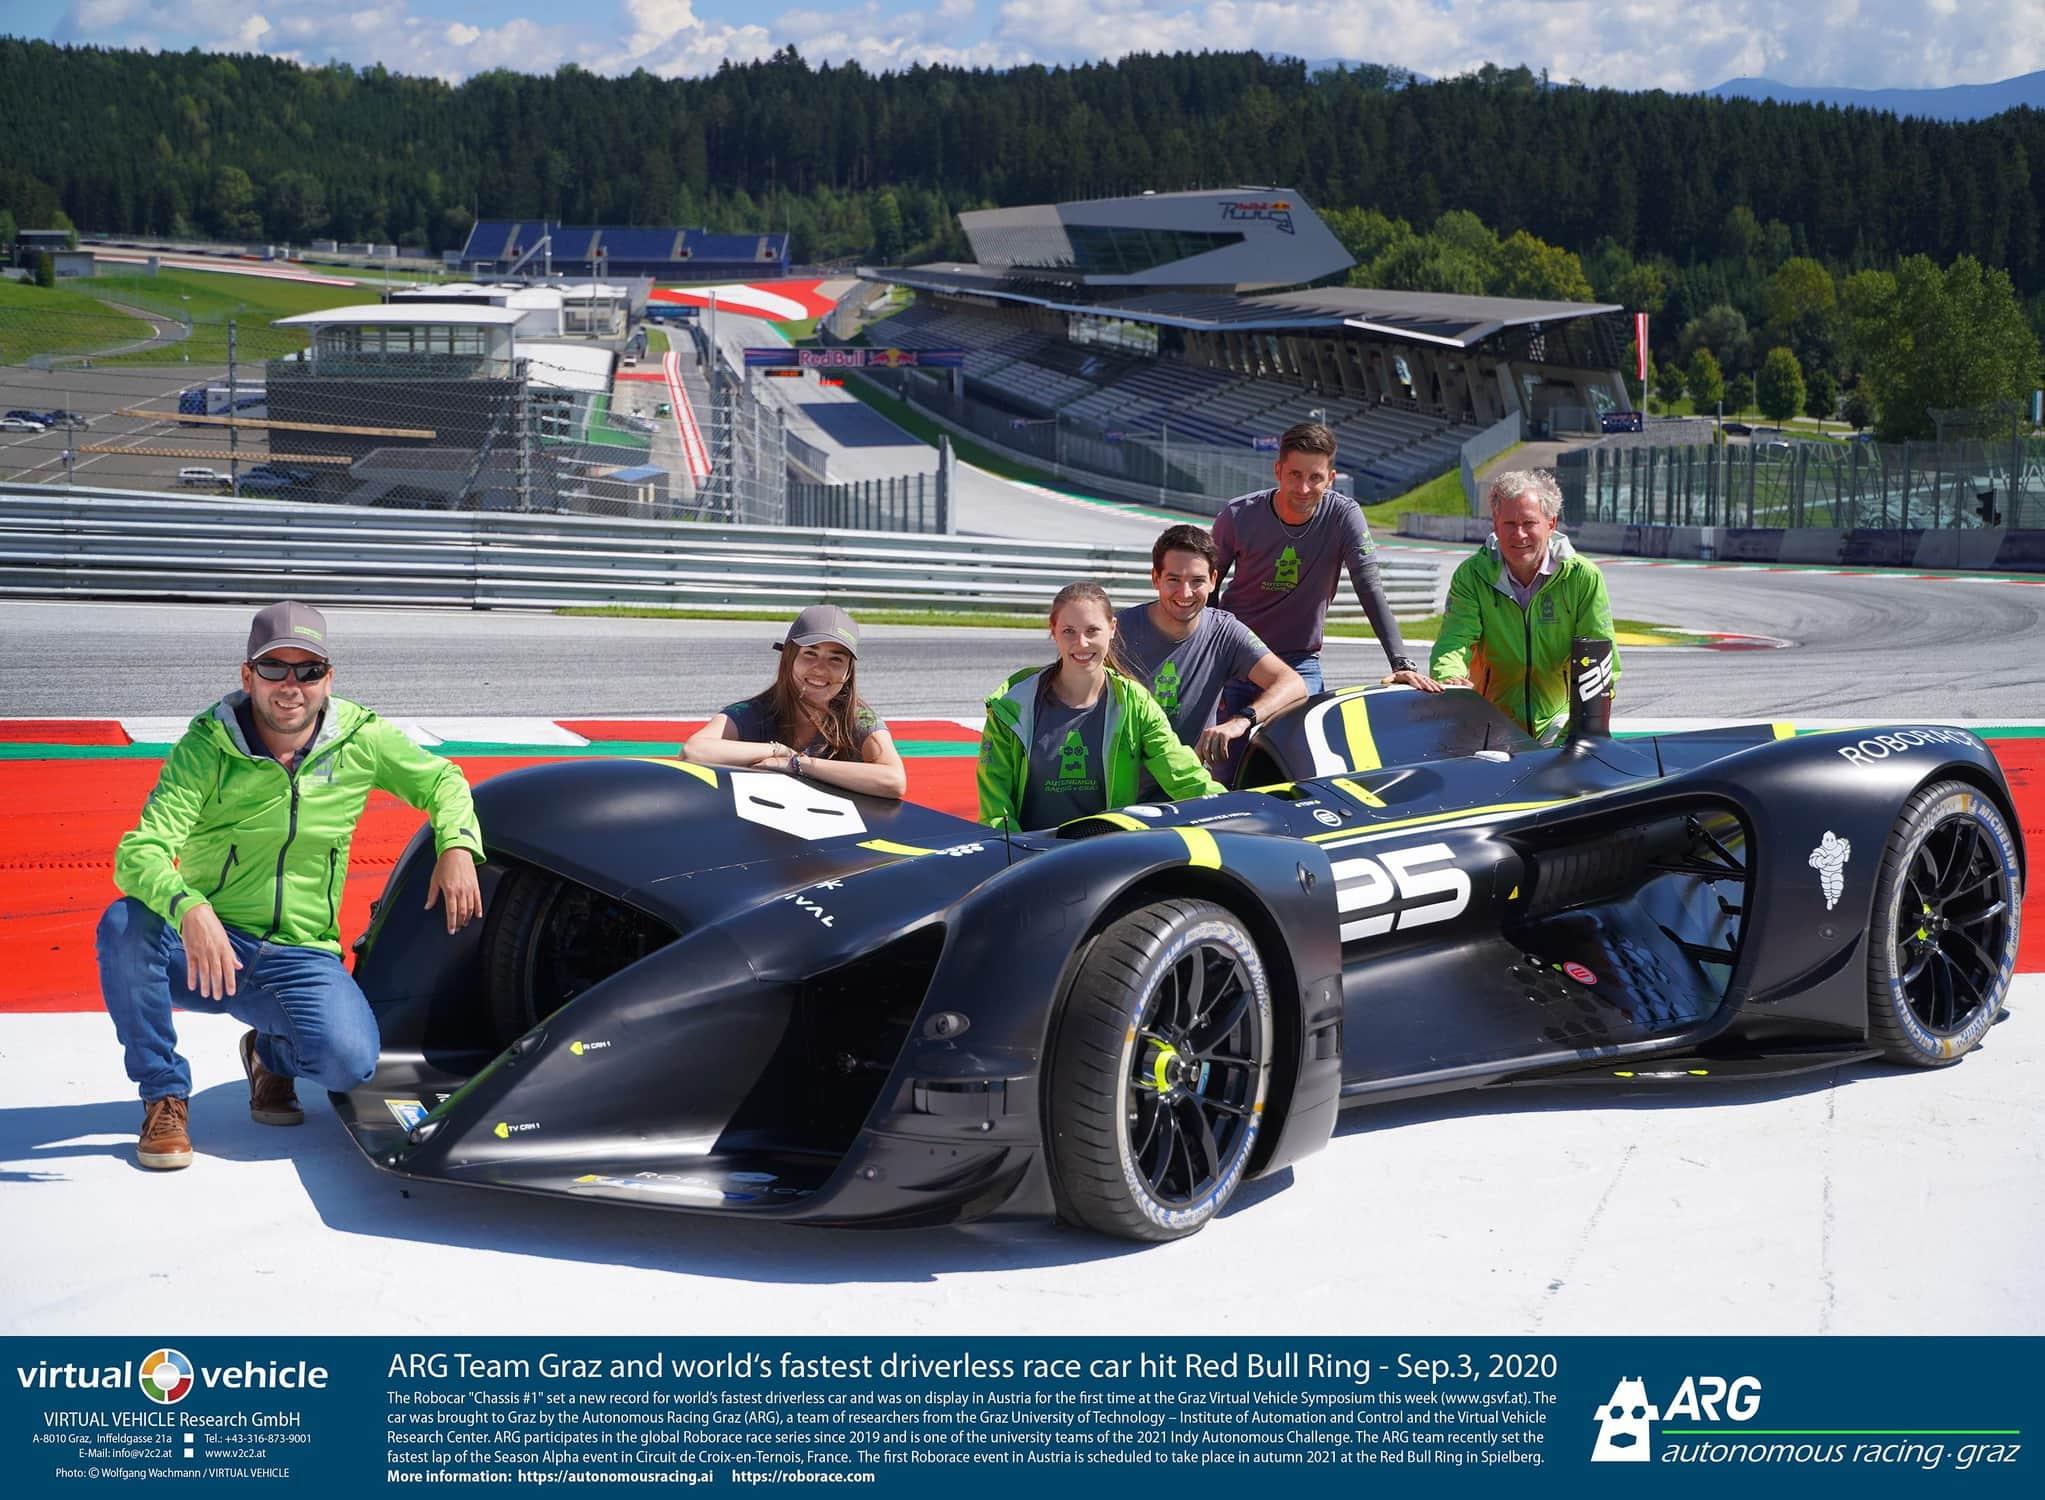 ARG Autonomous Racing Graz am Red Bull Ring zum ROBO RACE